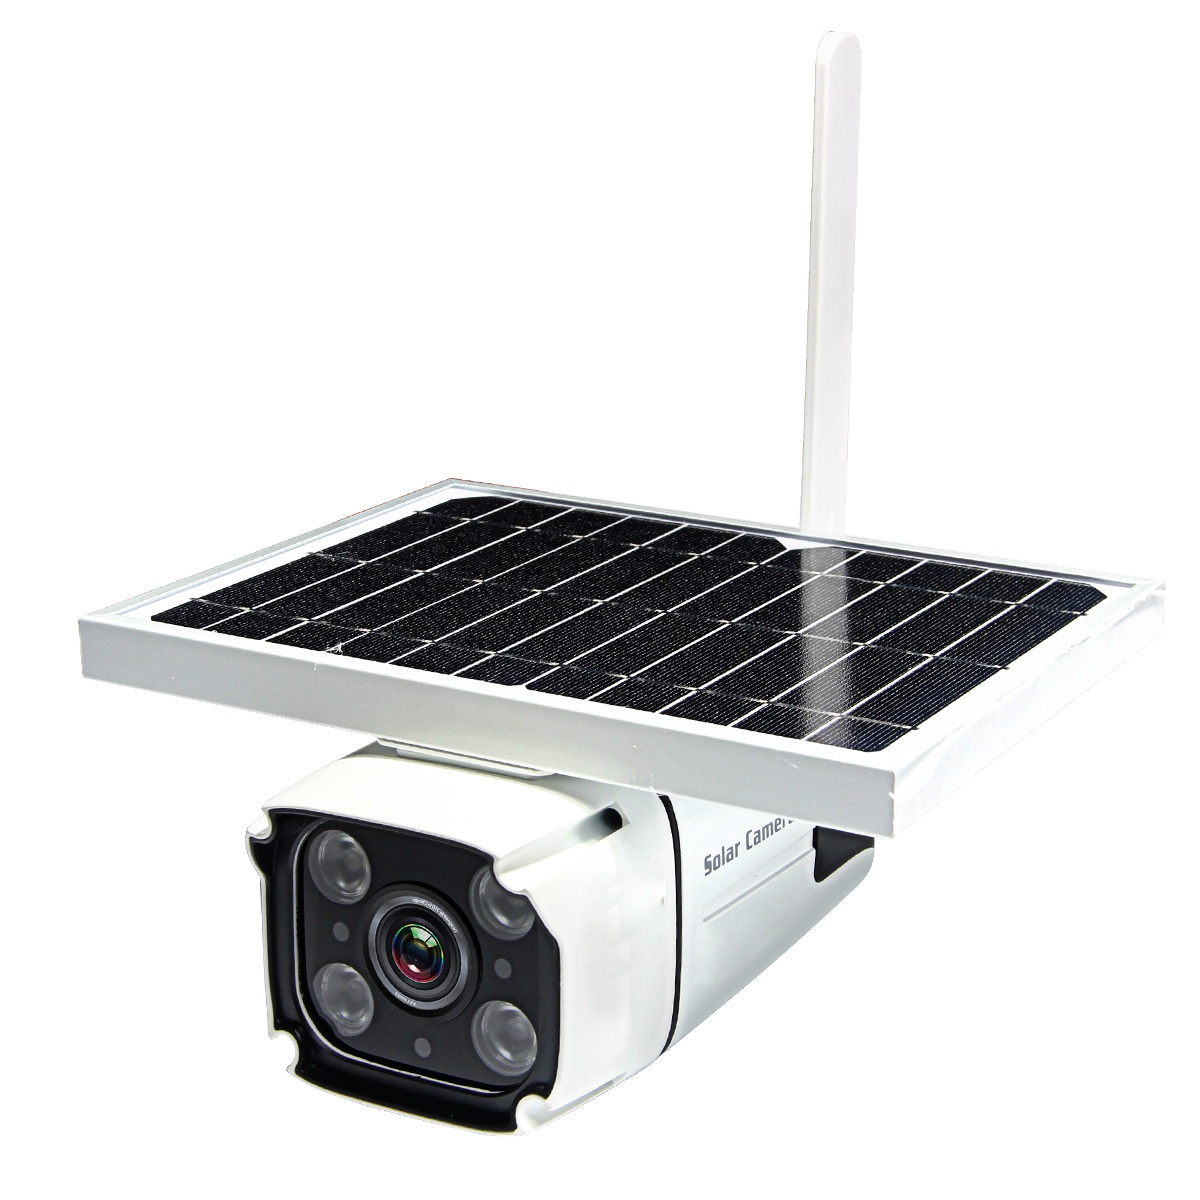 🔝 Robicam 4G SolarPRO Full HD 3 MP 4mm lens 🔝